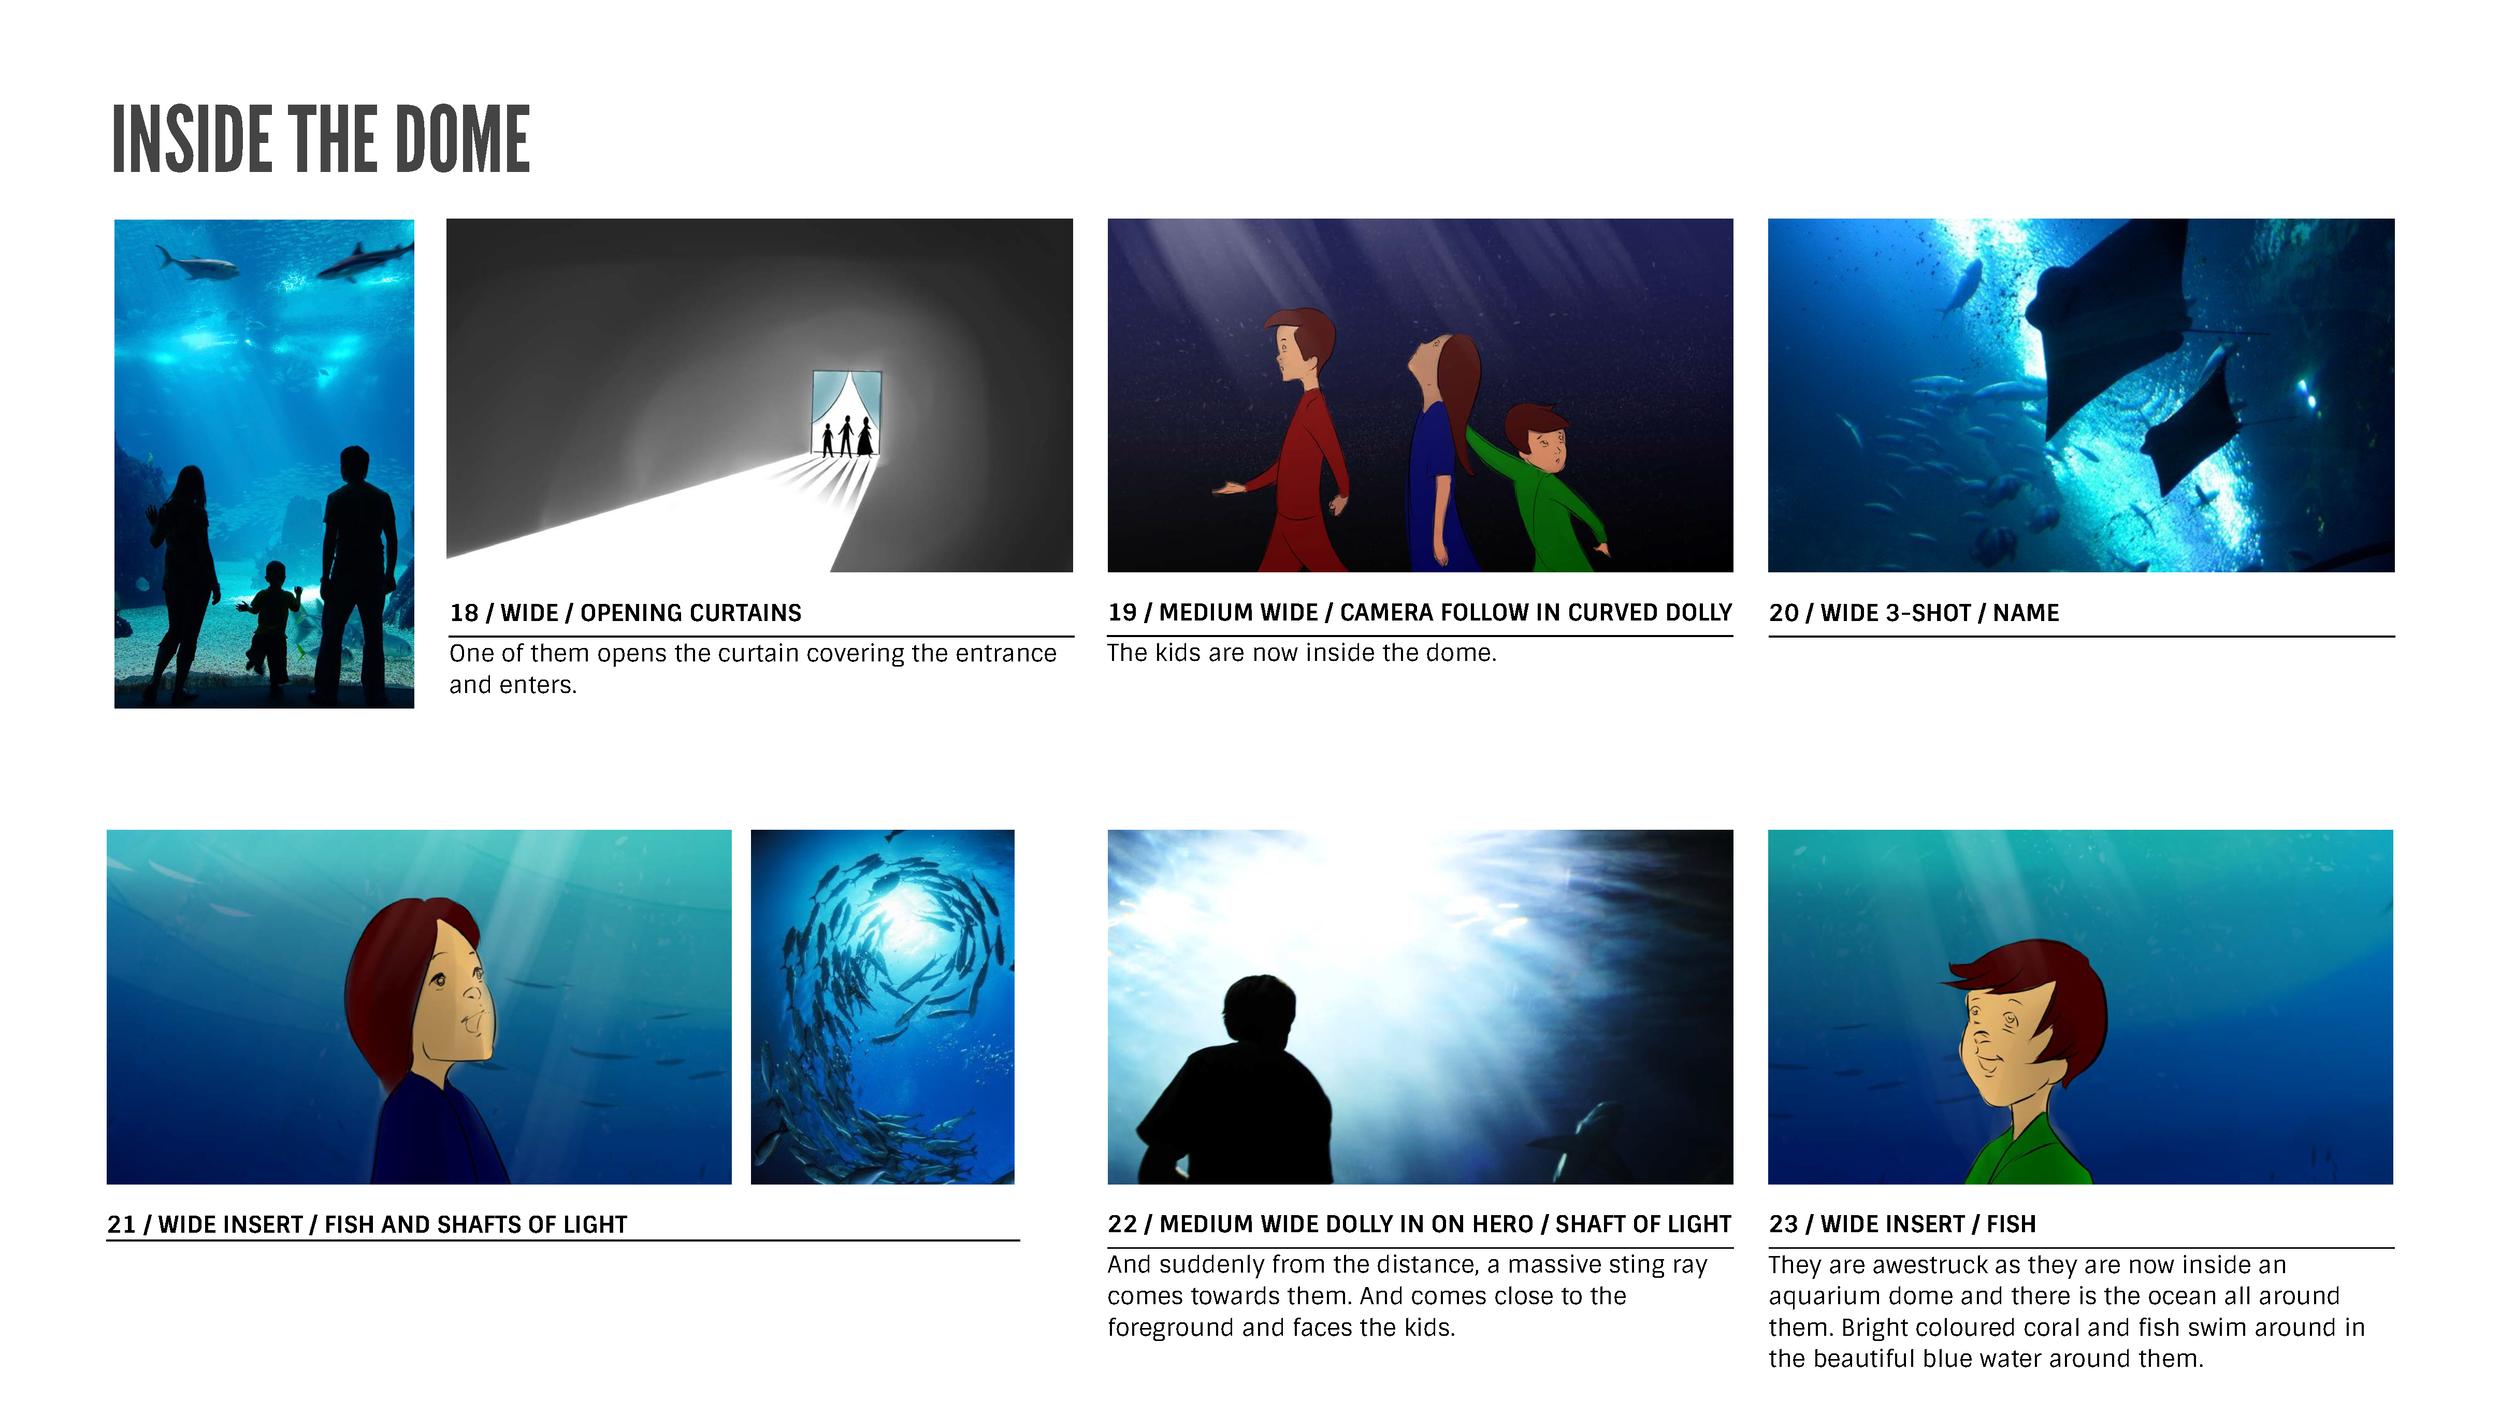 Samsung-Chiel-Kissfilms-Treatment-v8_Page_11.png